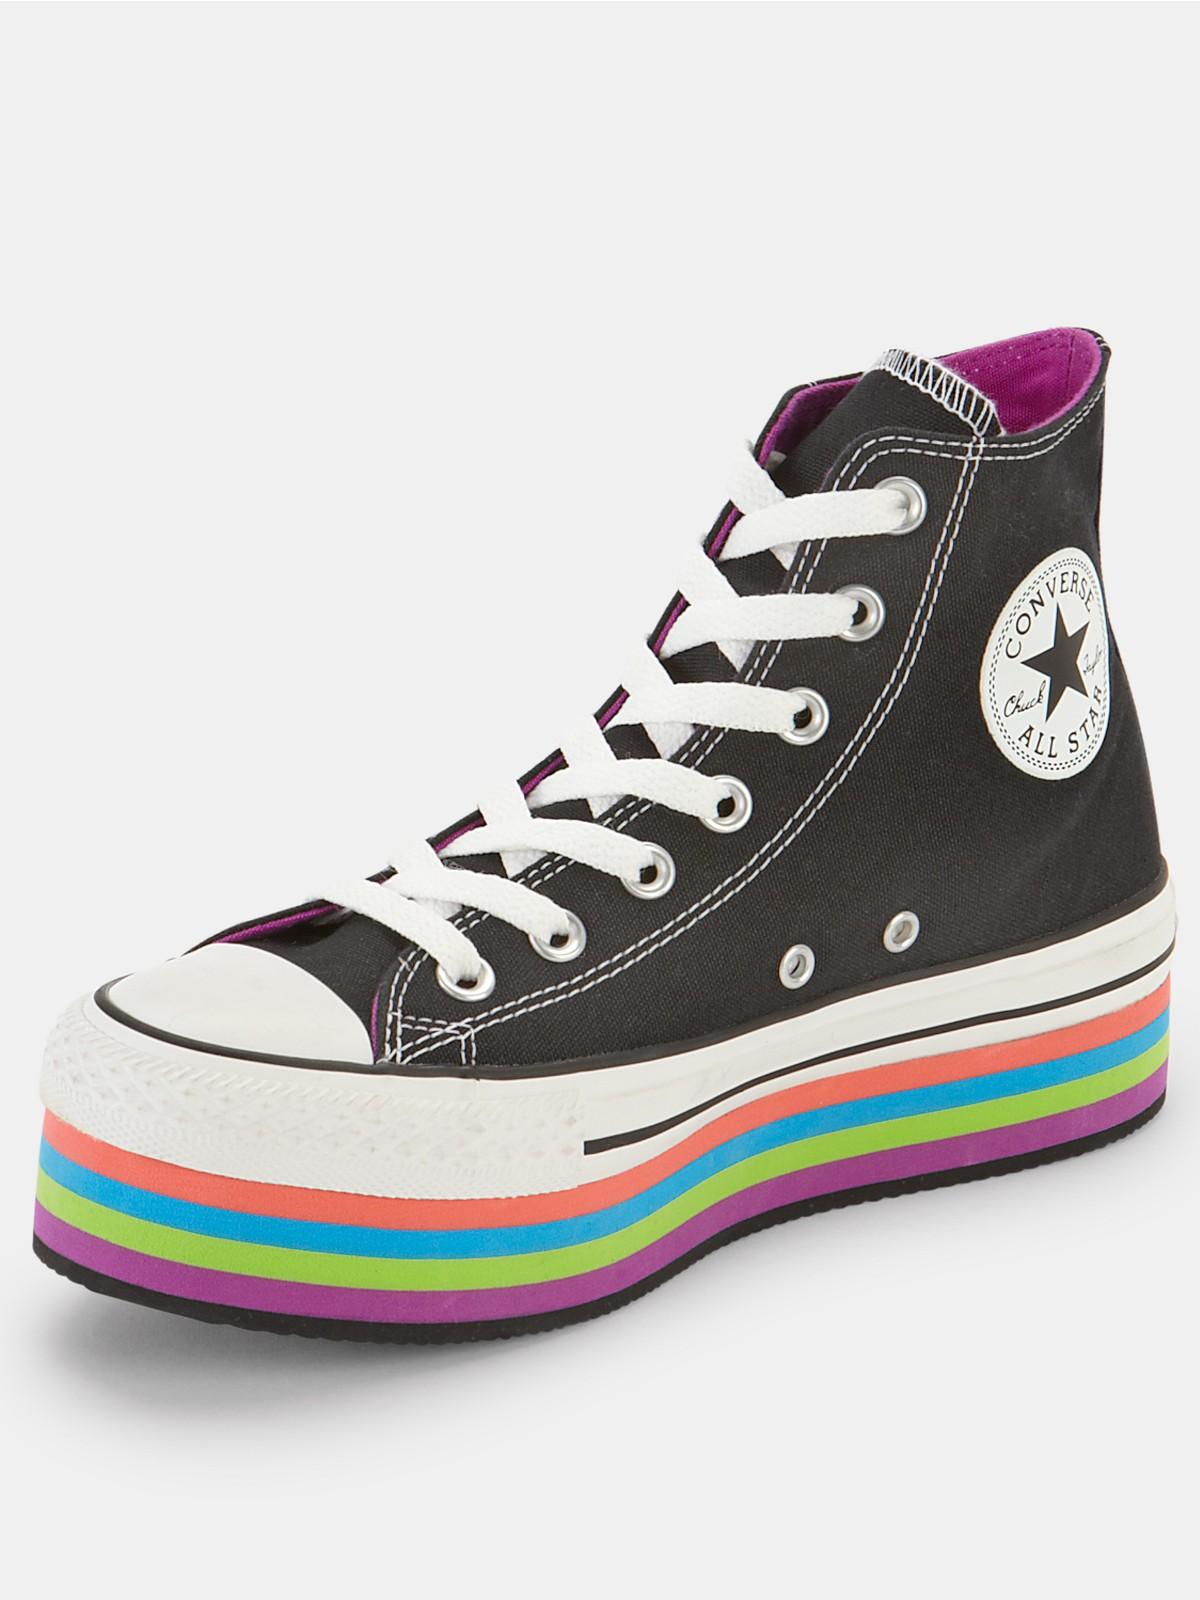 Converse All Star Shoe Grey White